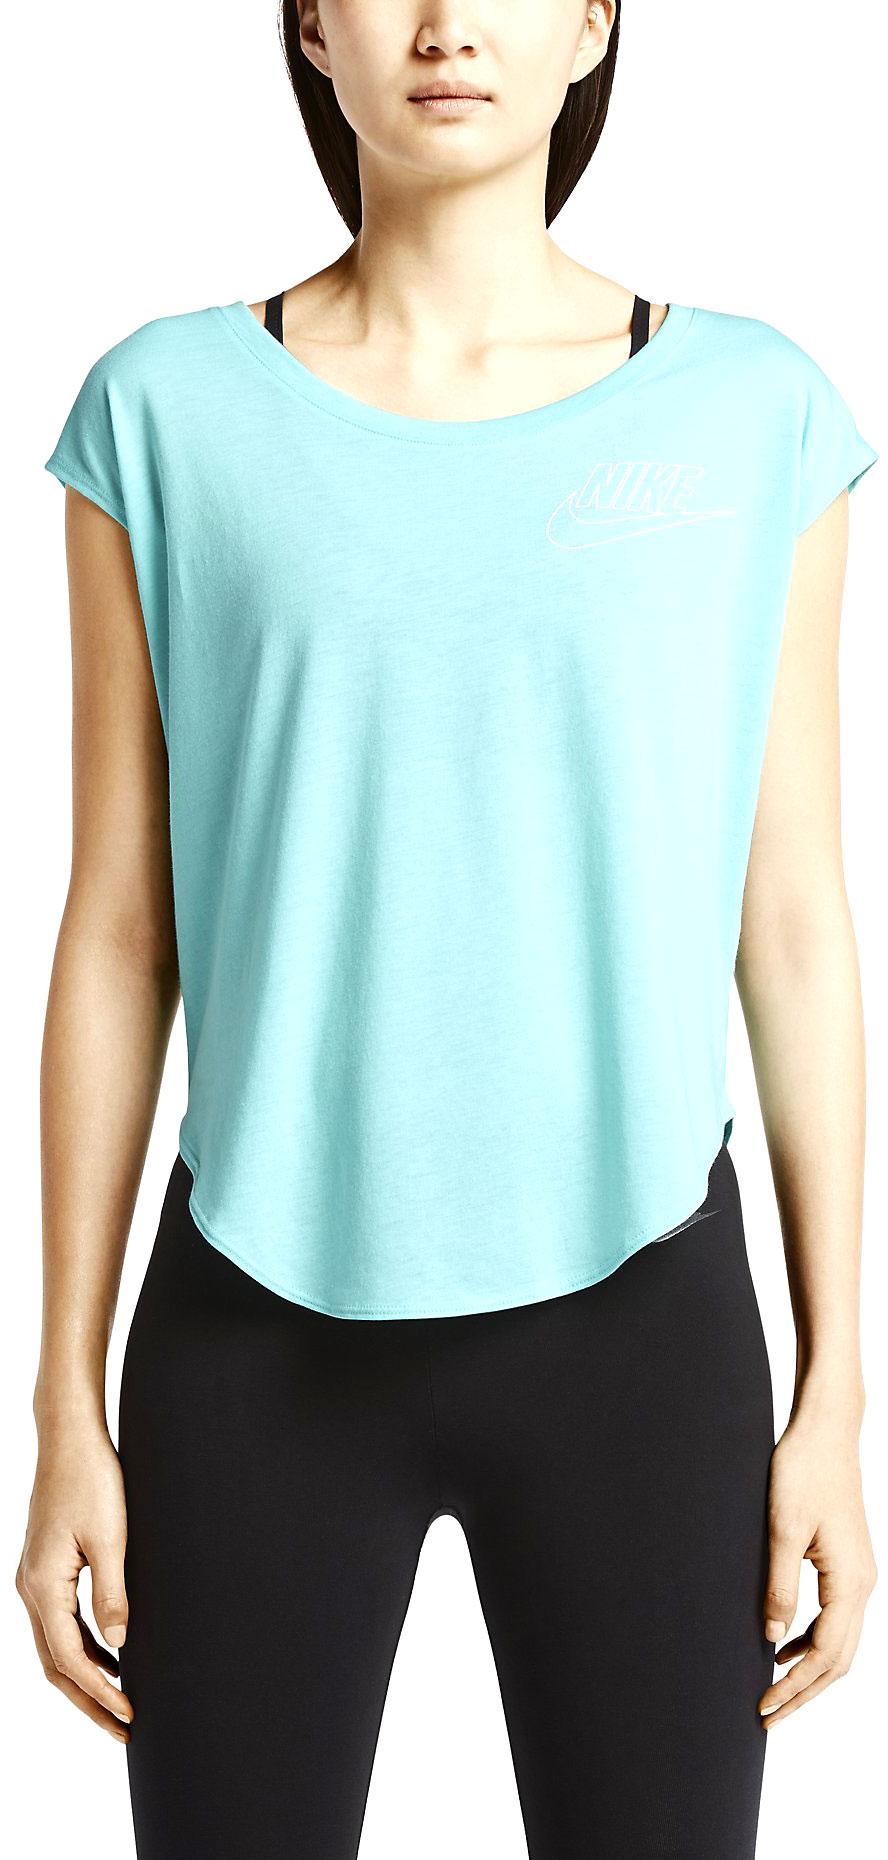 2a85a5aa5 Nike SIGNAL TEE-SMALL LOGO. SIGNAL TEE-SMALL LOGO - Women's T-Shirt